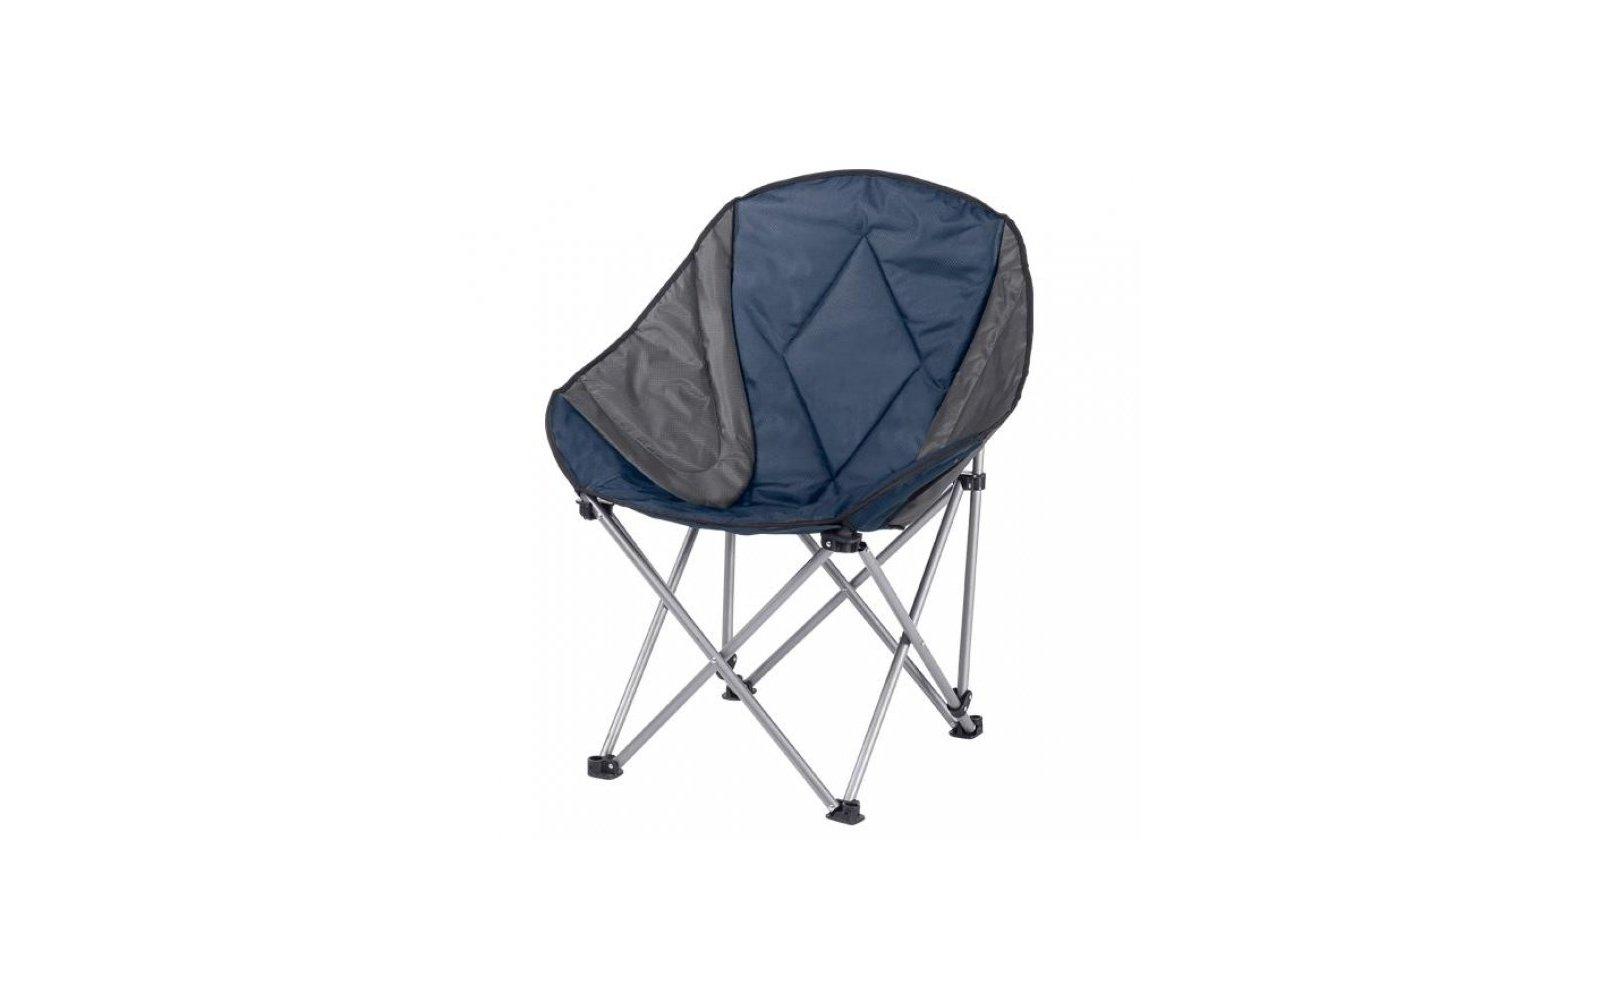 faltstuhl chillout fritz berger campingbedarf. Black Bedroom Furniture Sets. Home Design Ideas